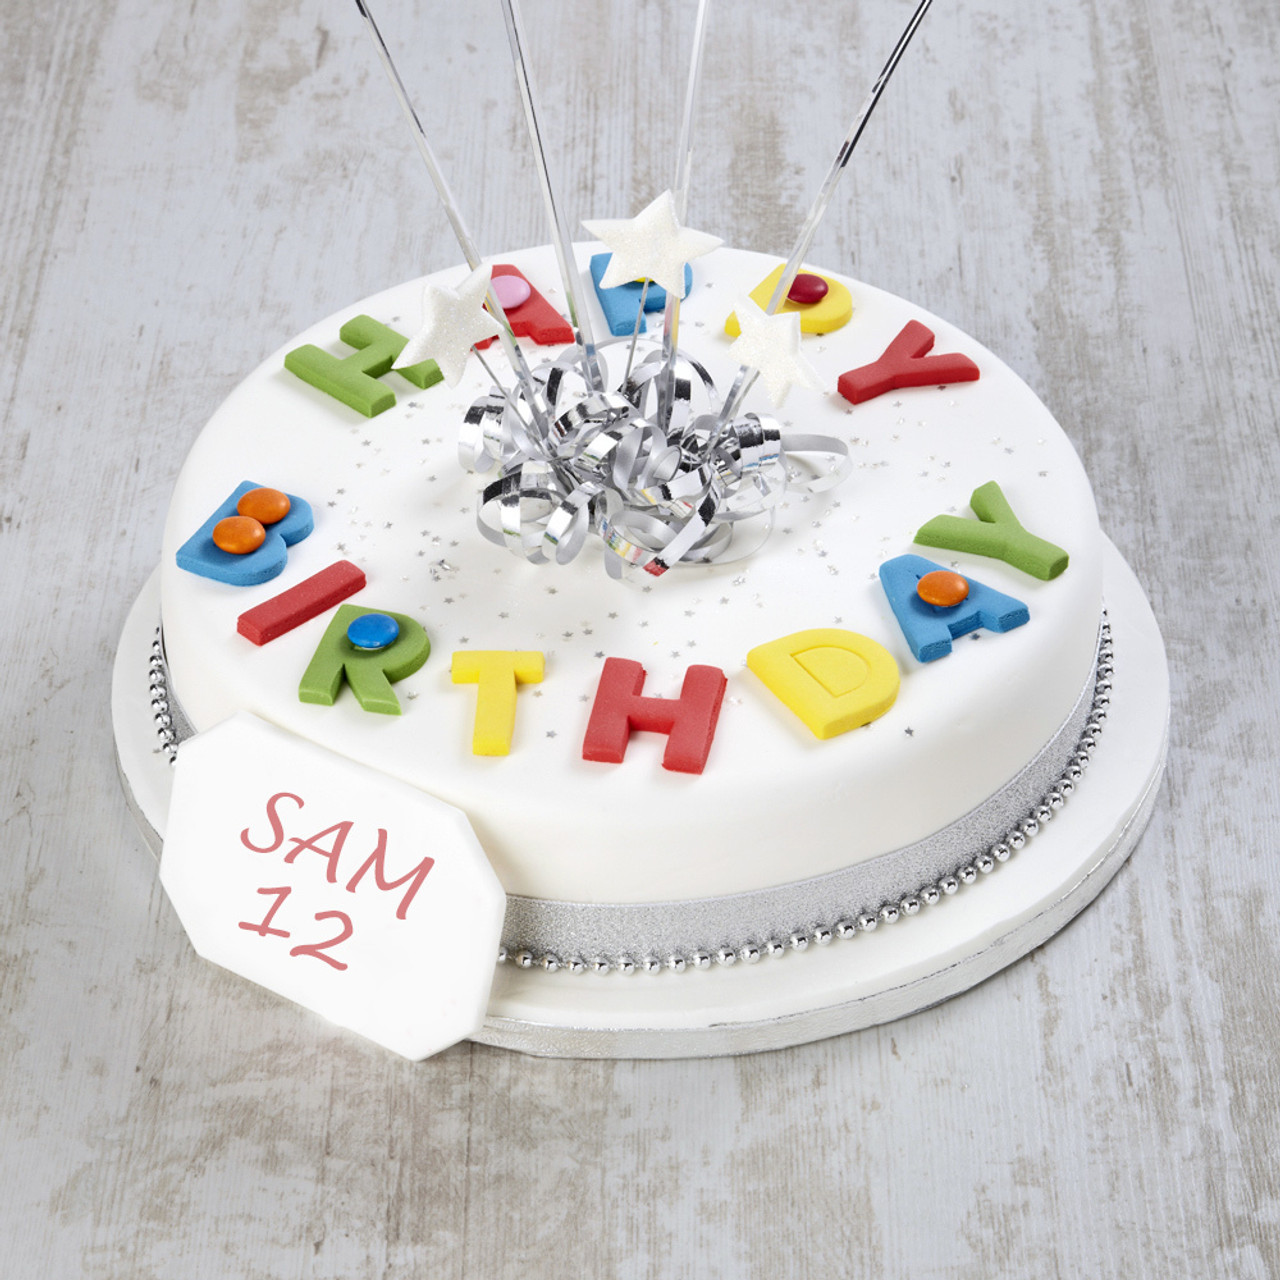 Fabulous Birthday Day Cake Order Online From The Brilliant Bakers Funny Birthday Cards Online Benoljebrpdamsfinfo